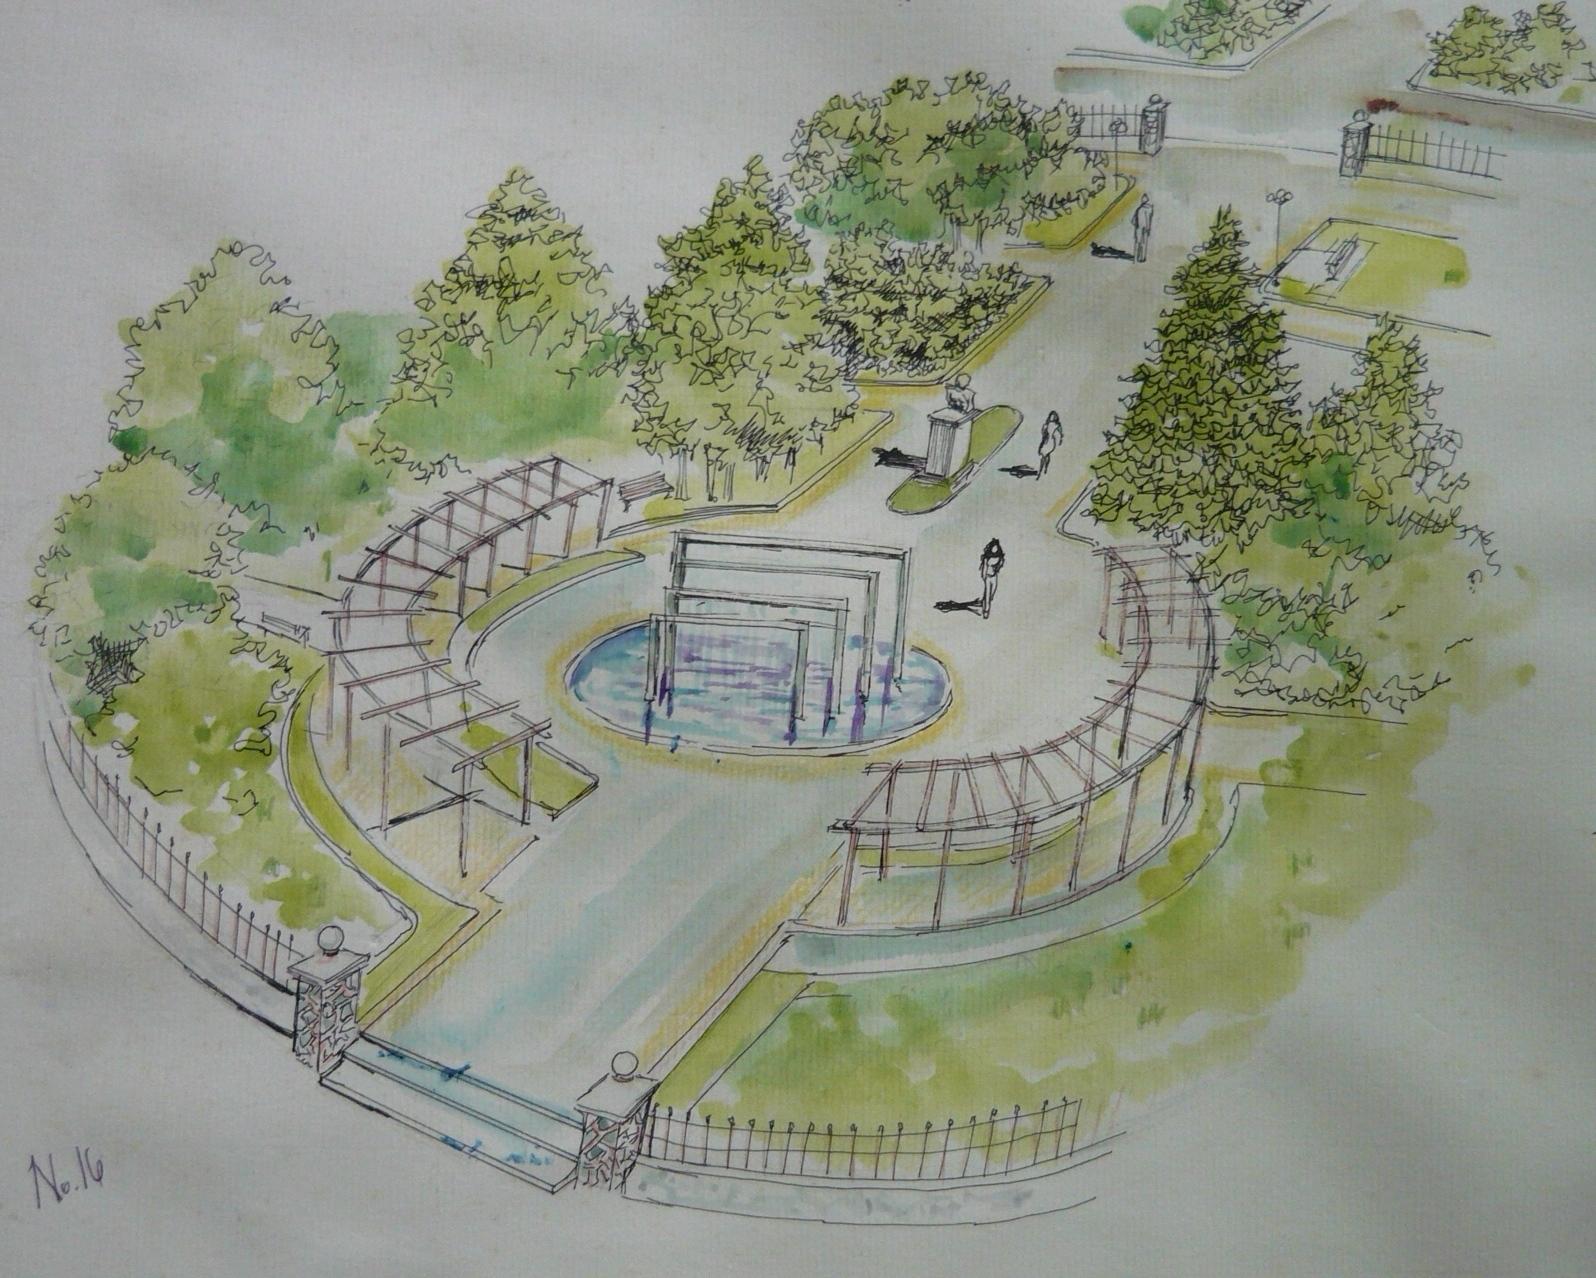 Portafolio dise o iv arquitectura 2011 dise o parque - Arquitectura de diseno ...